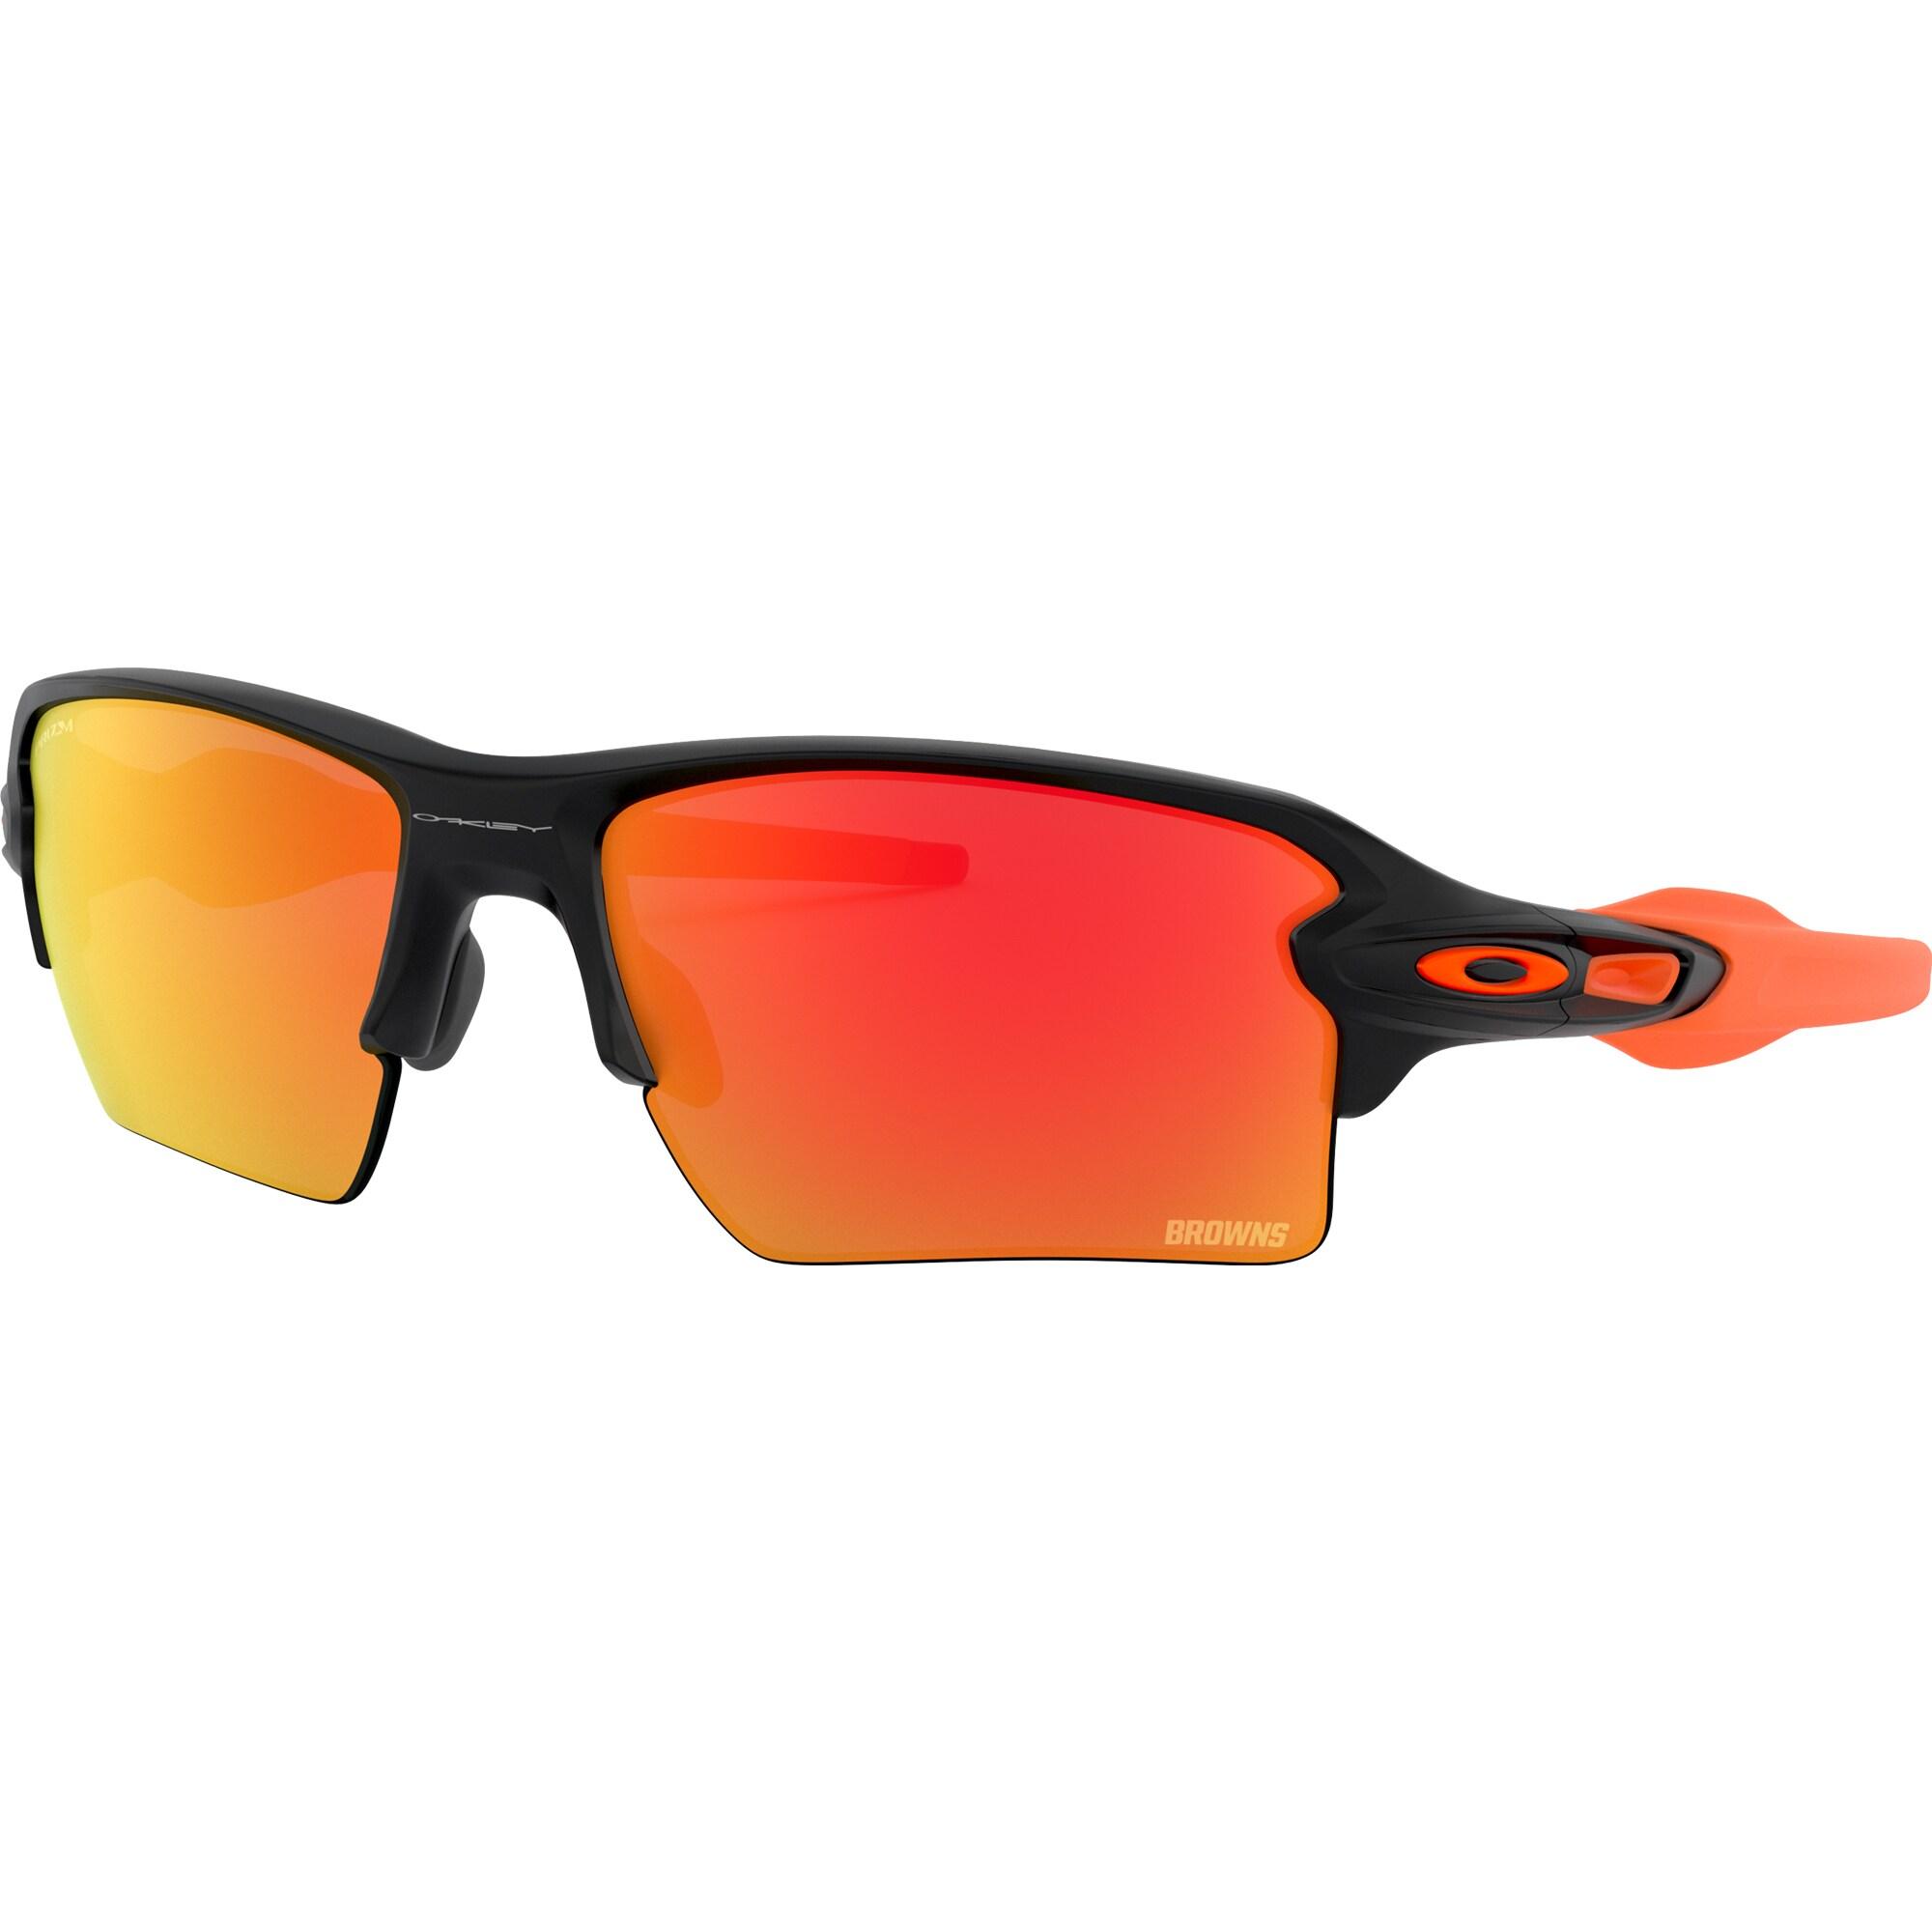 Cleveland Browns Oakley Flak 2.0 XL Sunglasses